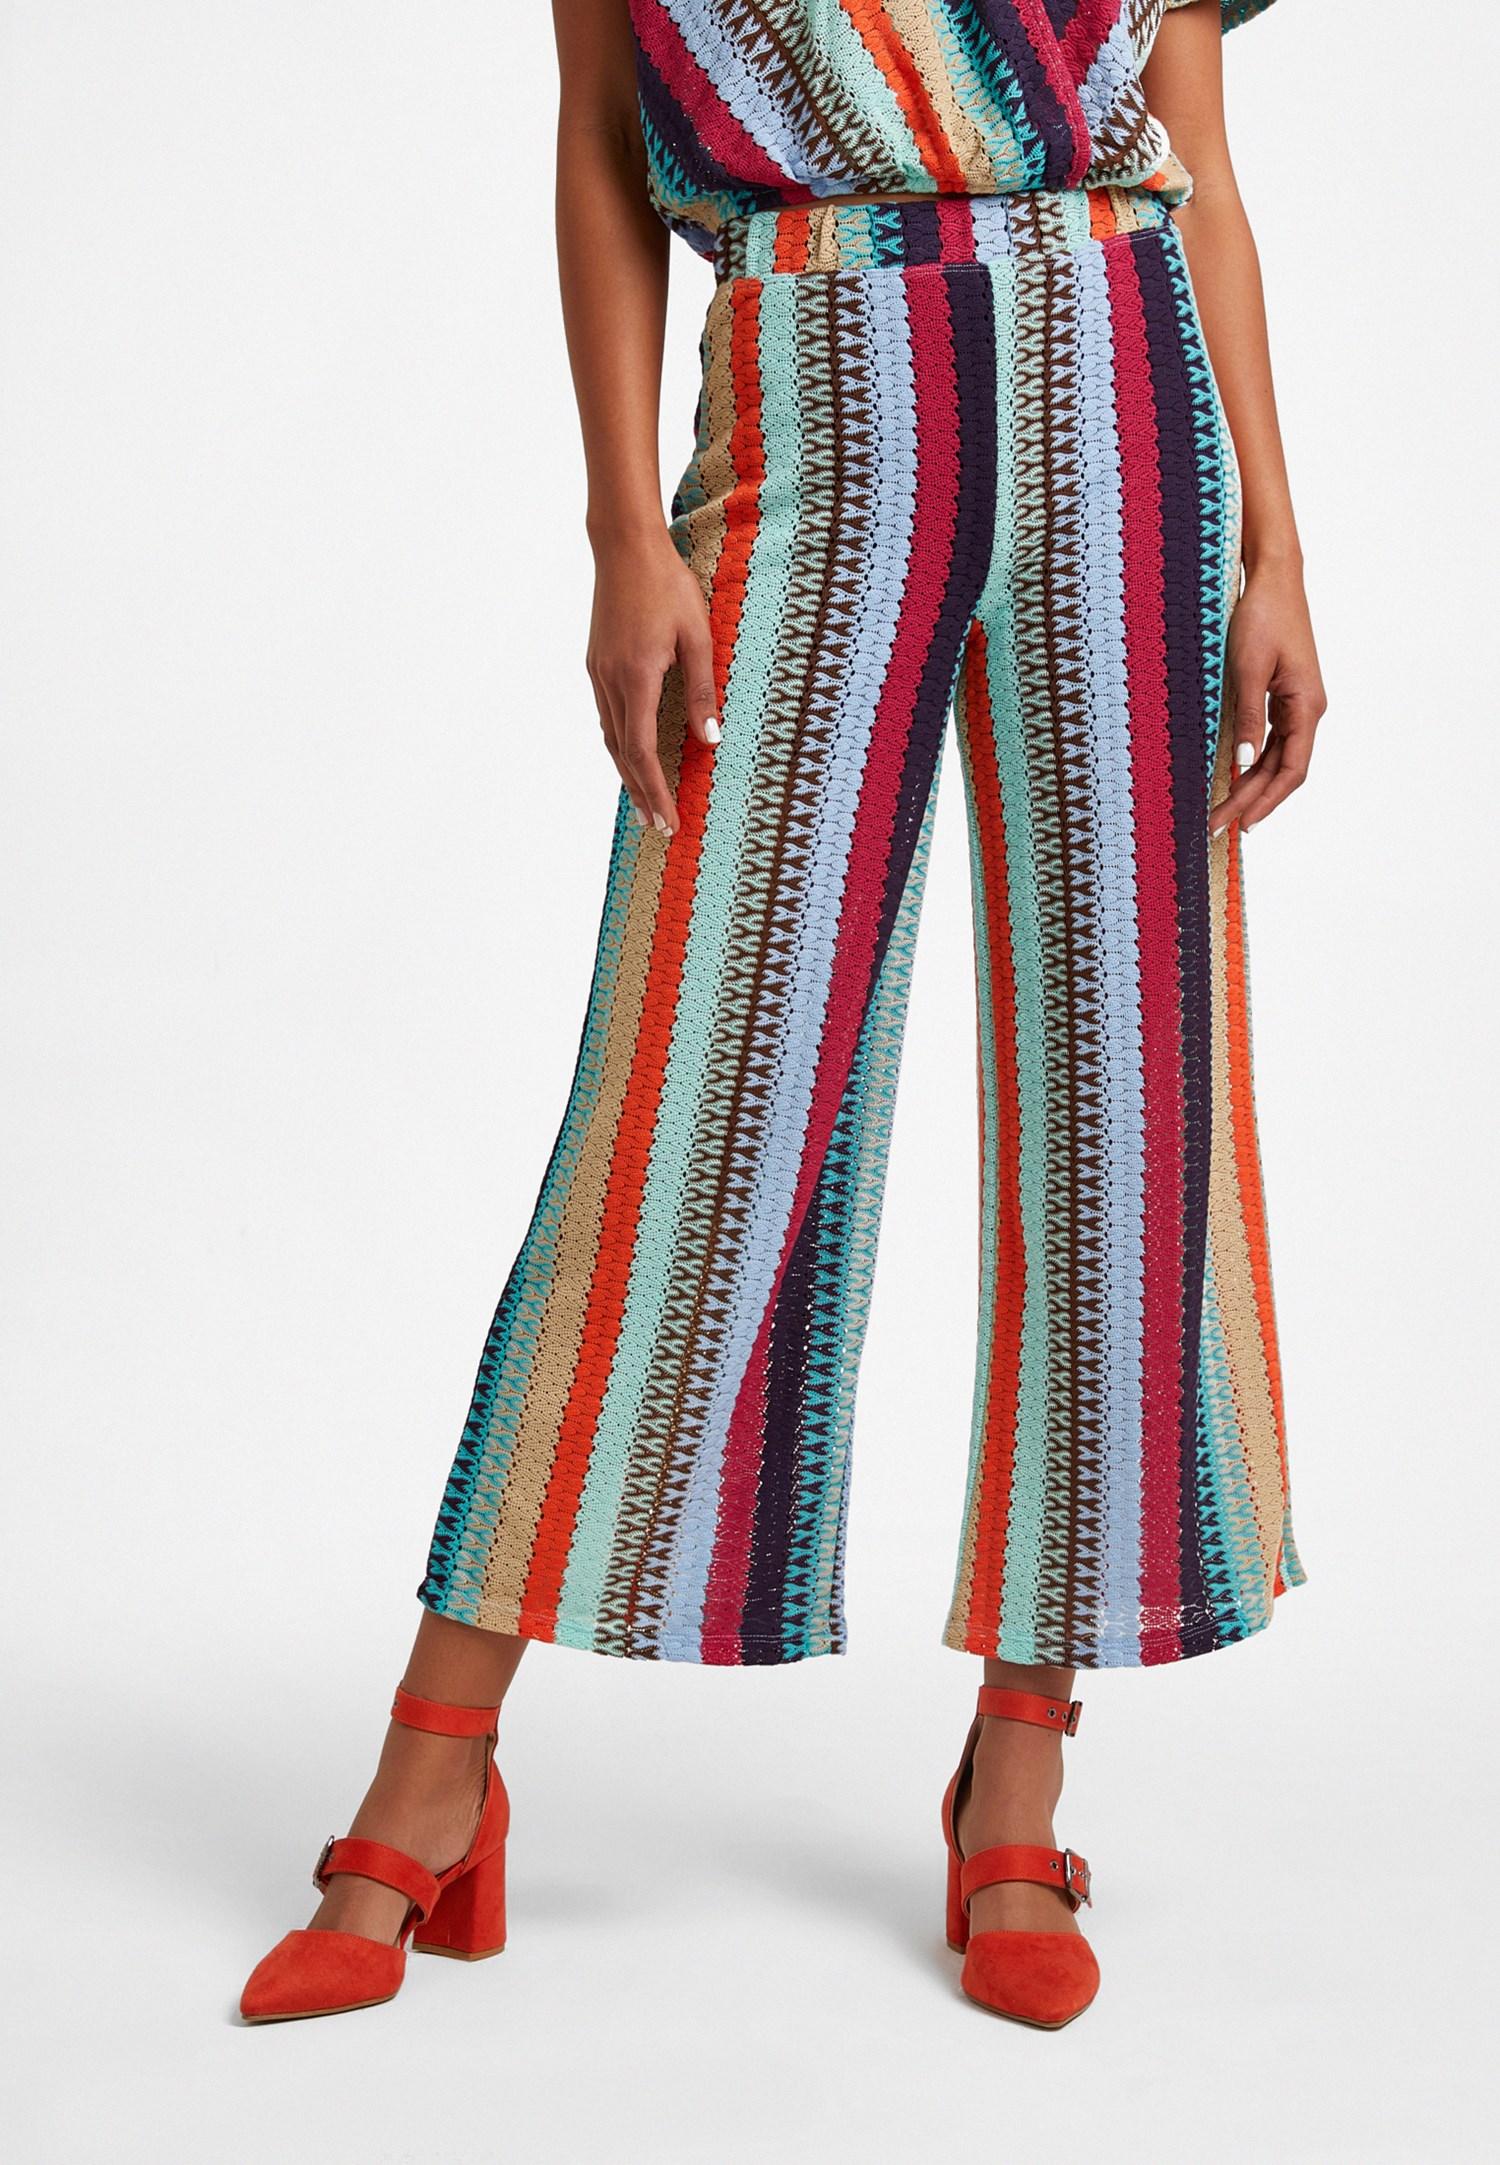 Bayan Çok Renkli Yüksek Bel Culotte Pantolon